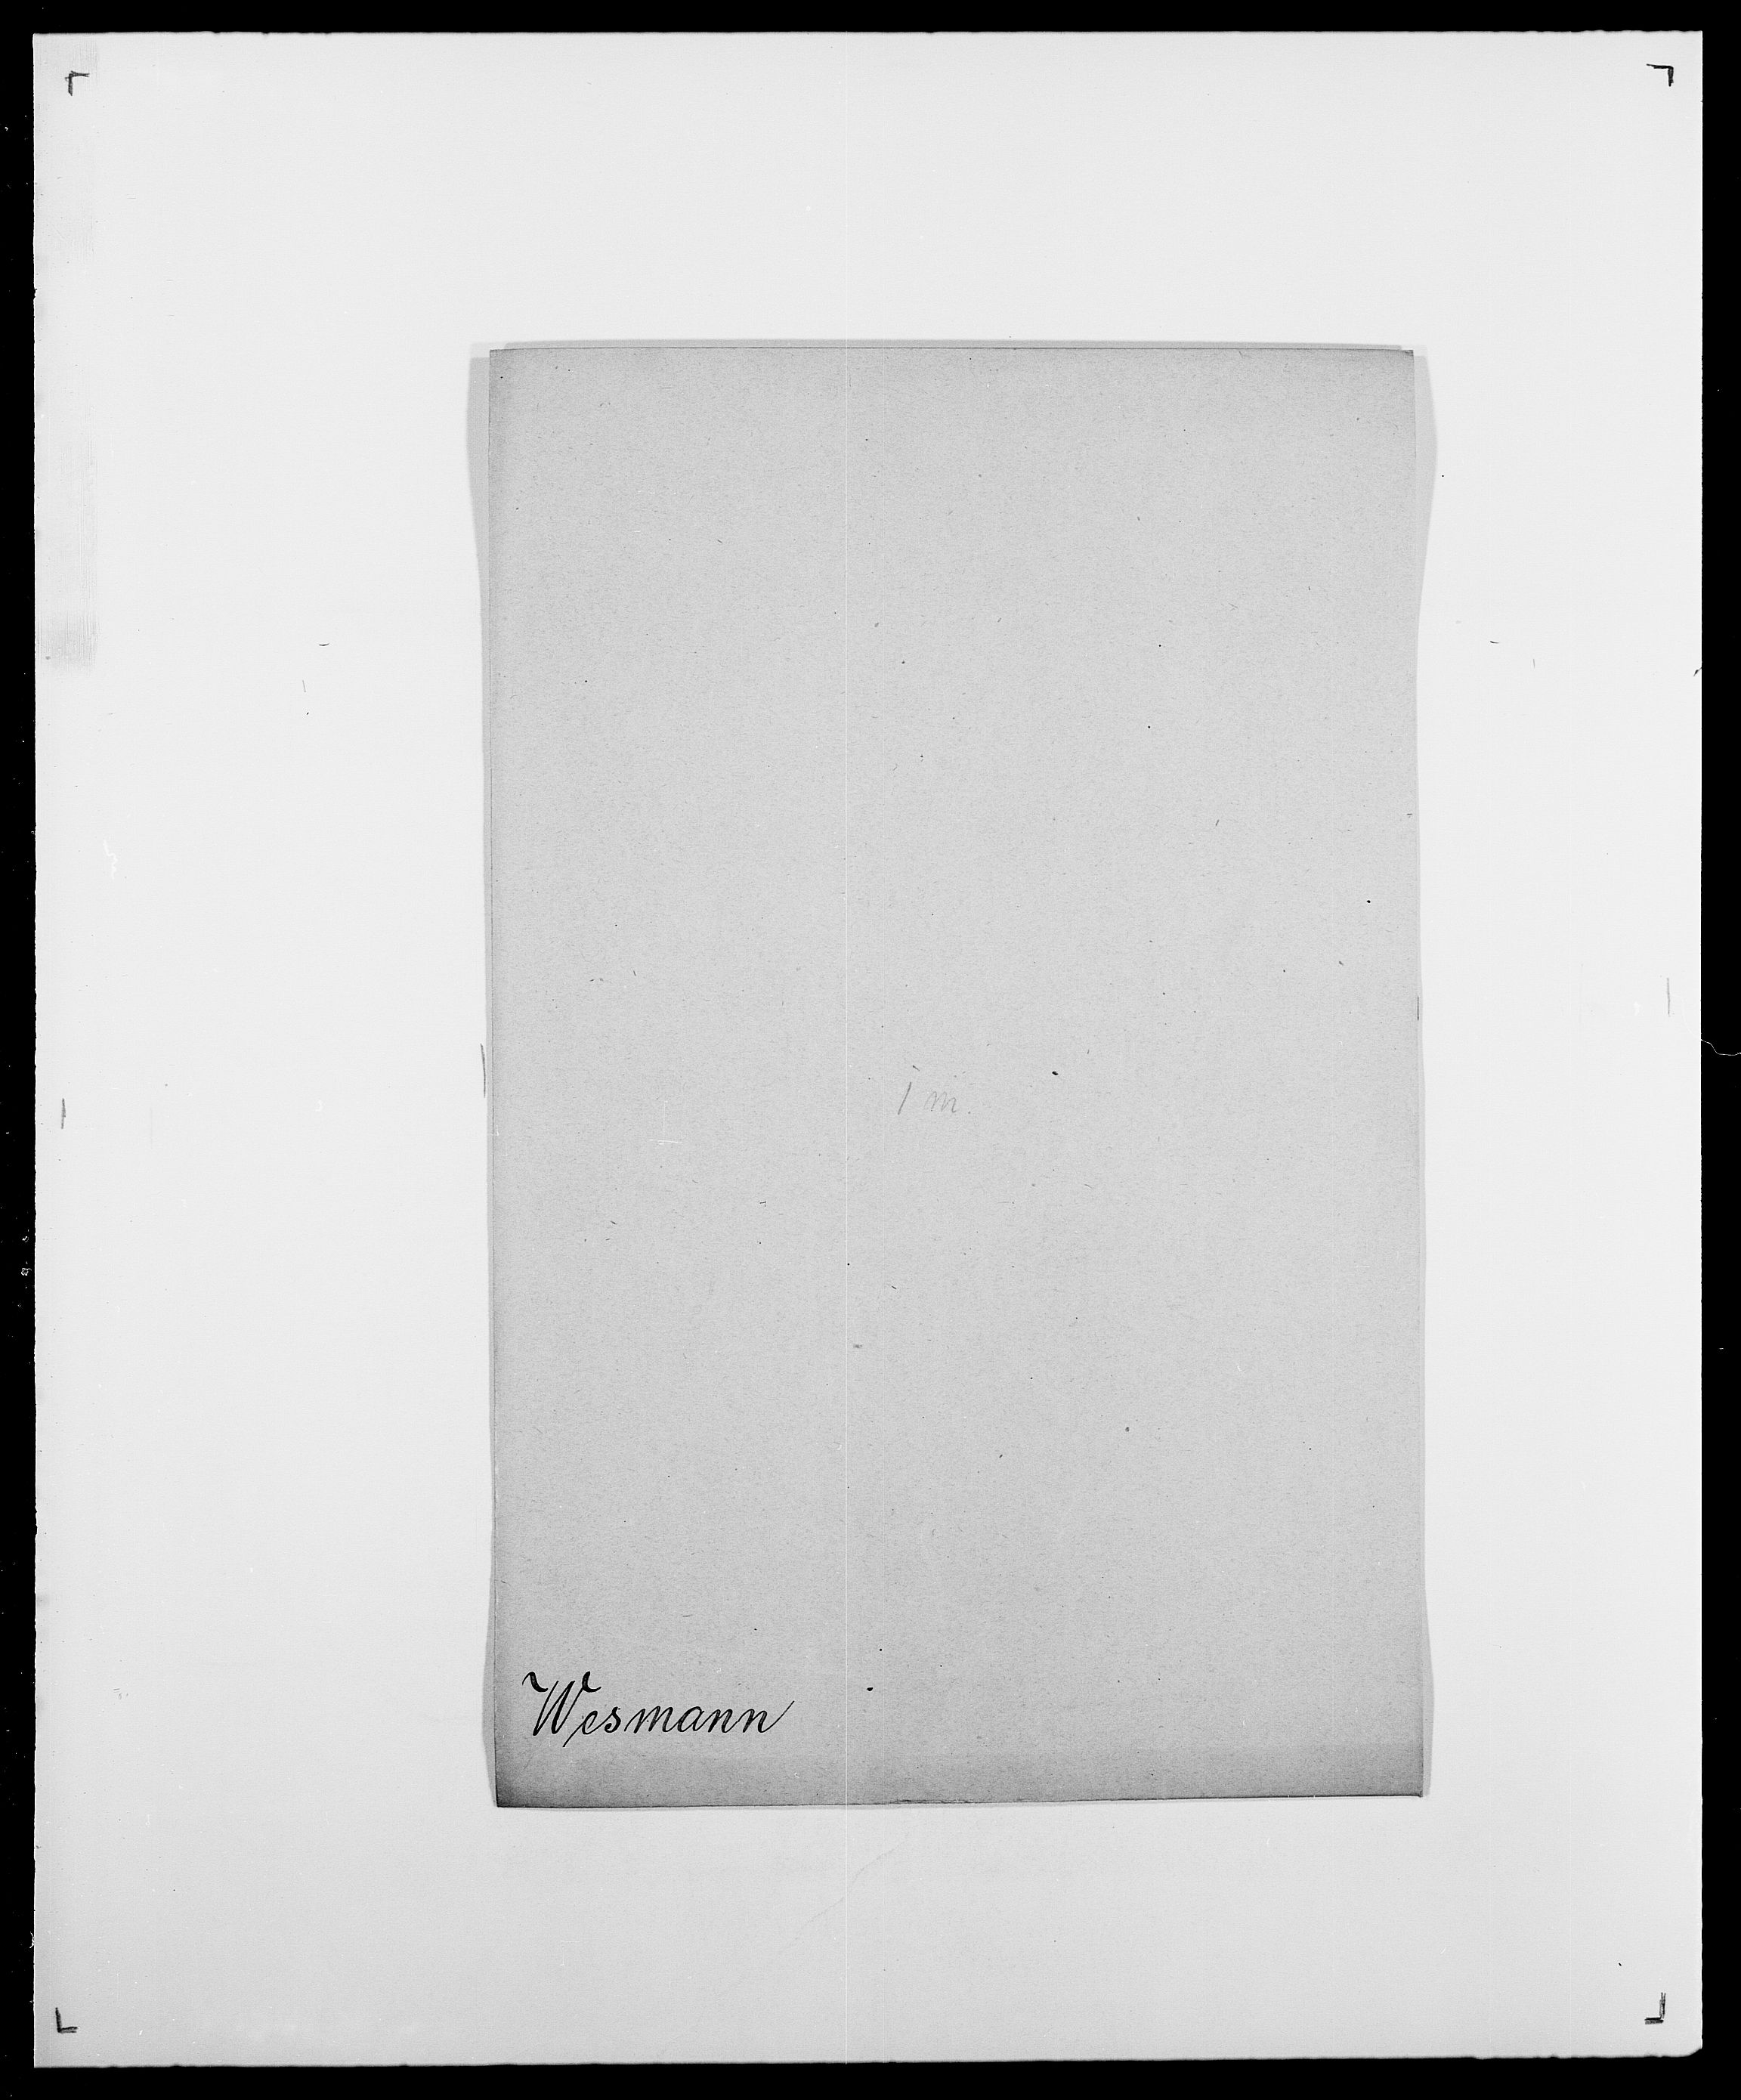 SAO, Delgobe, Charles Antoine - samling, D/Da/L0041: Vemmestad - Viker, s. 185